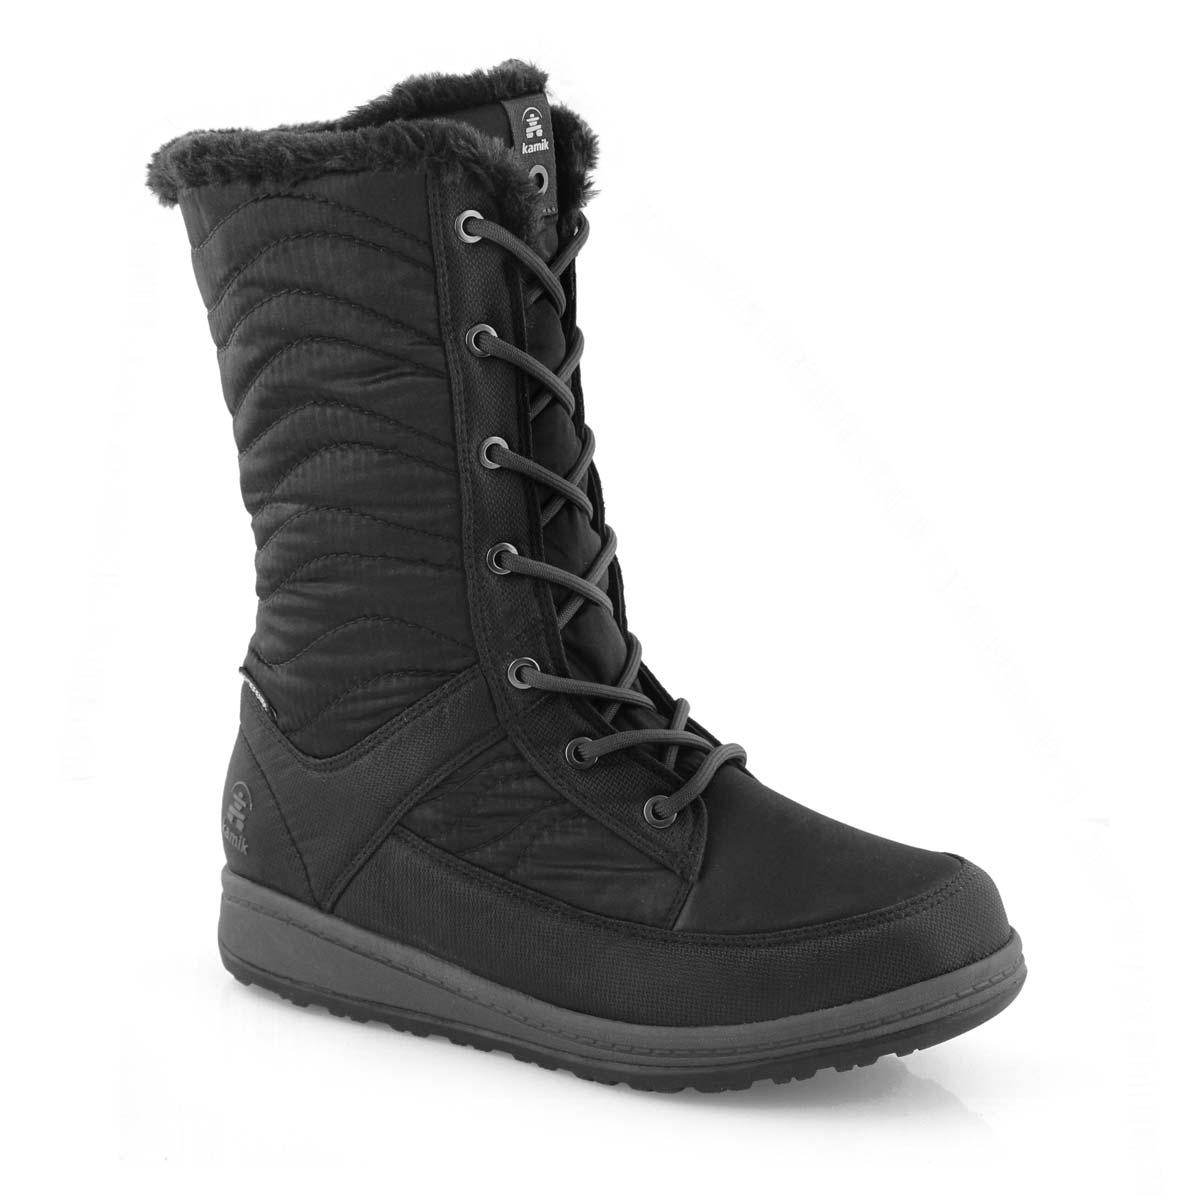 WOMENS Kamik Bailee Black Winter Boots New In